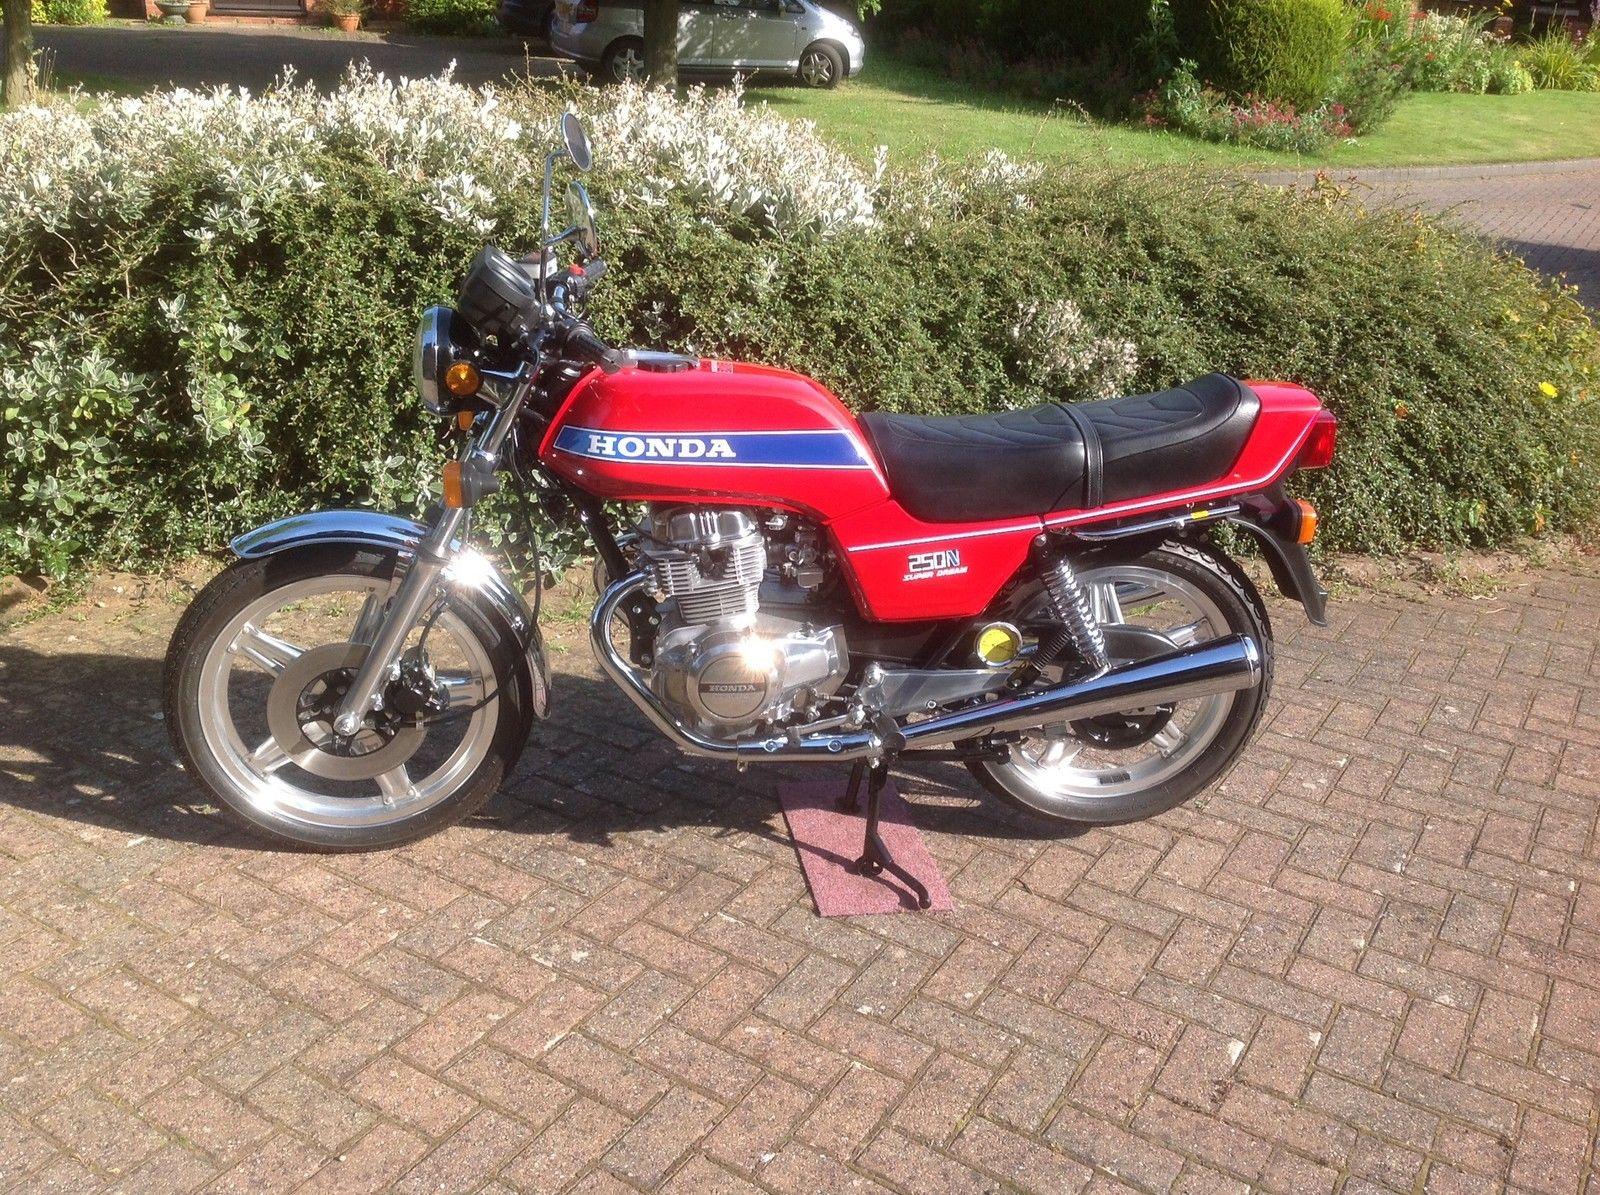 Restored Honda CB250N Superdream - 1979 Photographs at ...